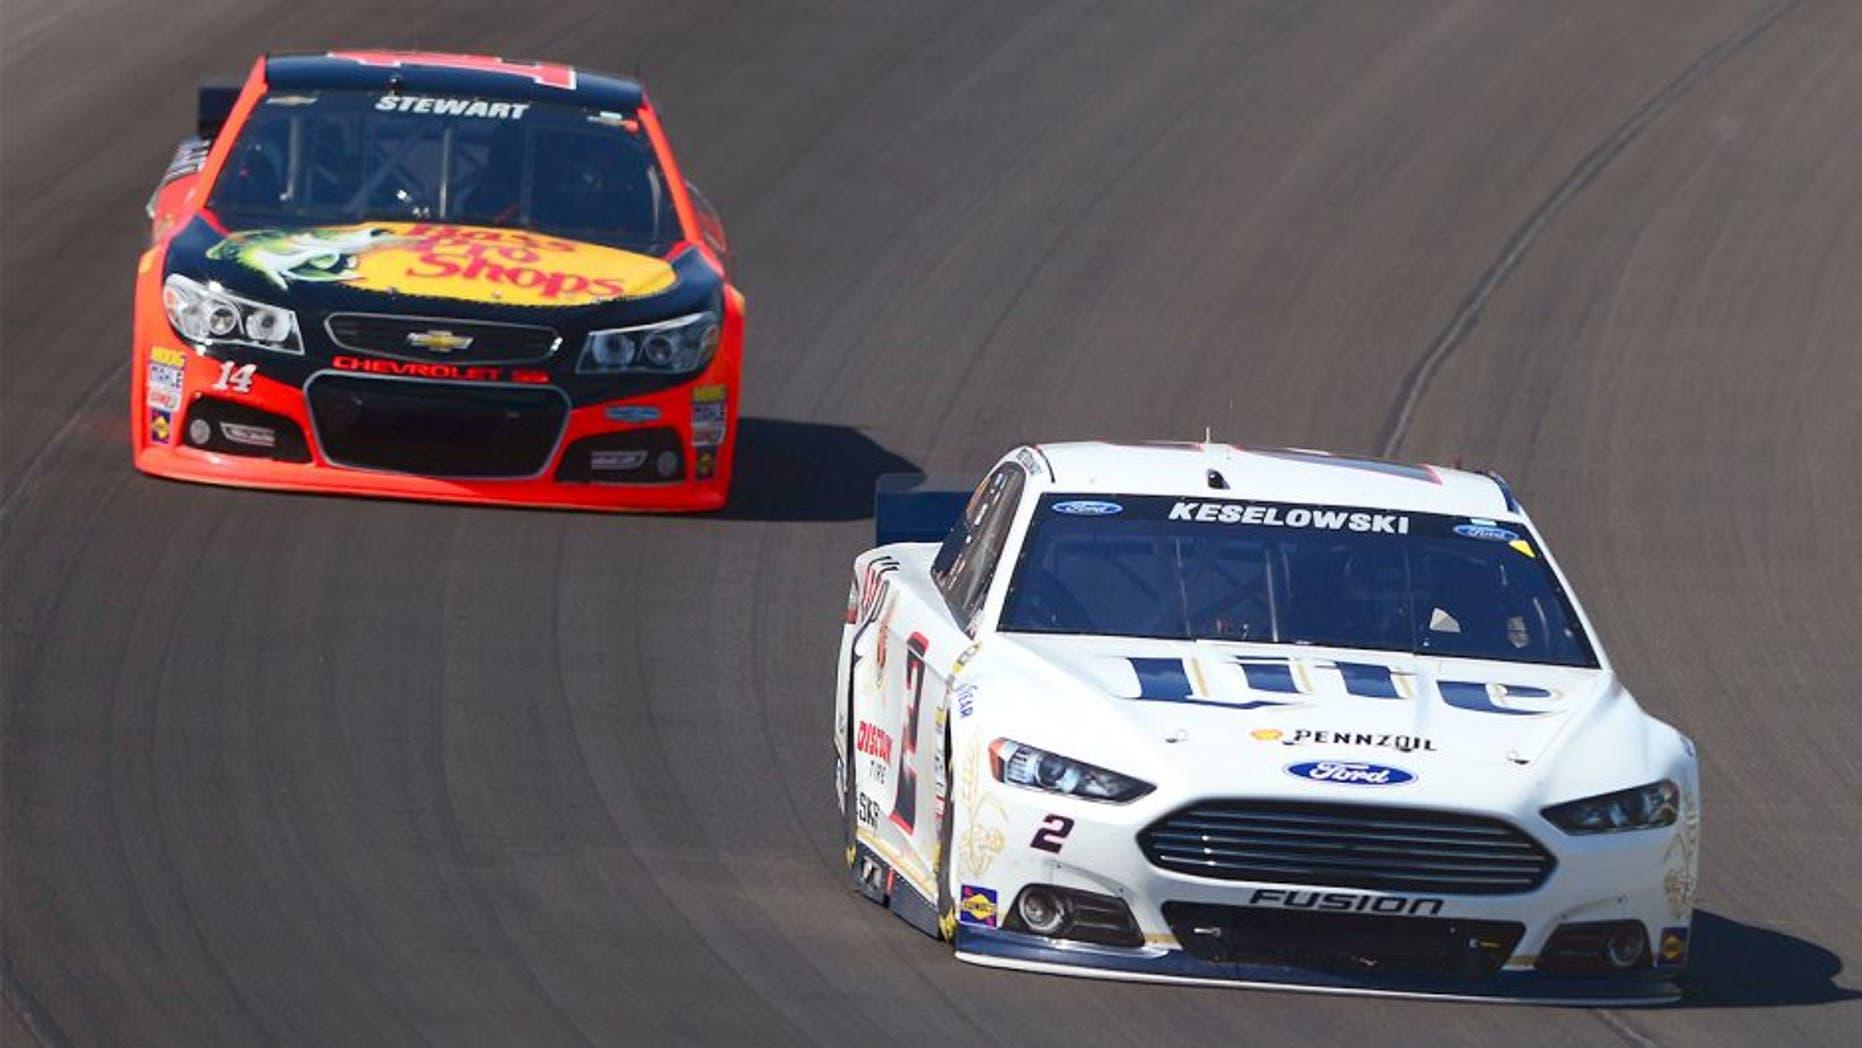 Jun 15, 2014; Brooklyn, MI, USA; NASCAR Sprint Cup Series driver Brad Keselowski leads Tony Stewart during the Quicken Loans 400 at Michigan International Speedway. Mandatory Credit: Andrew Weber-USA TODAY Sports